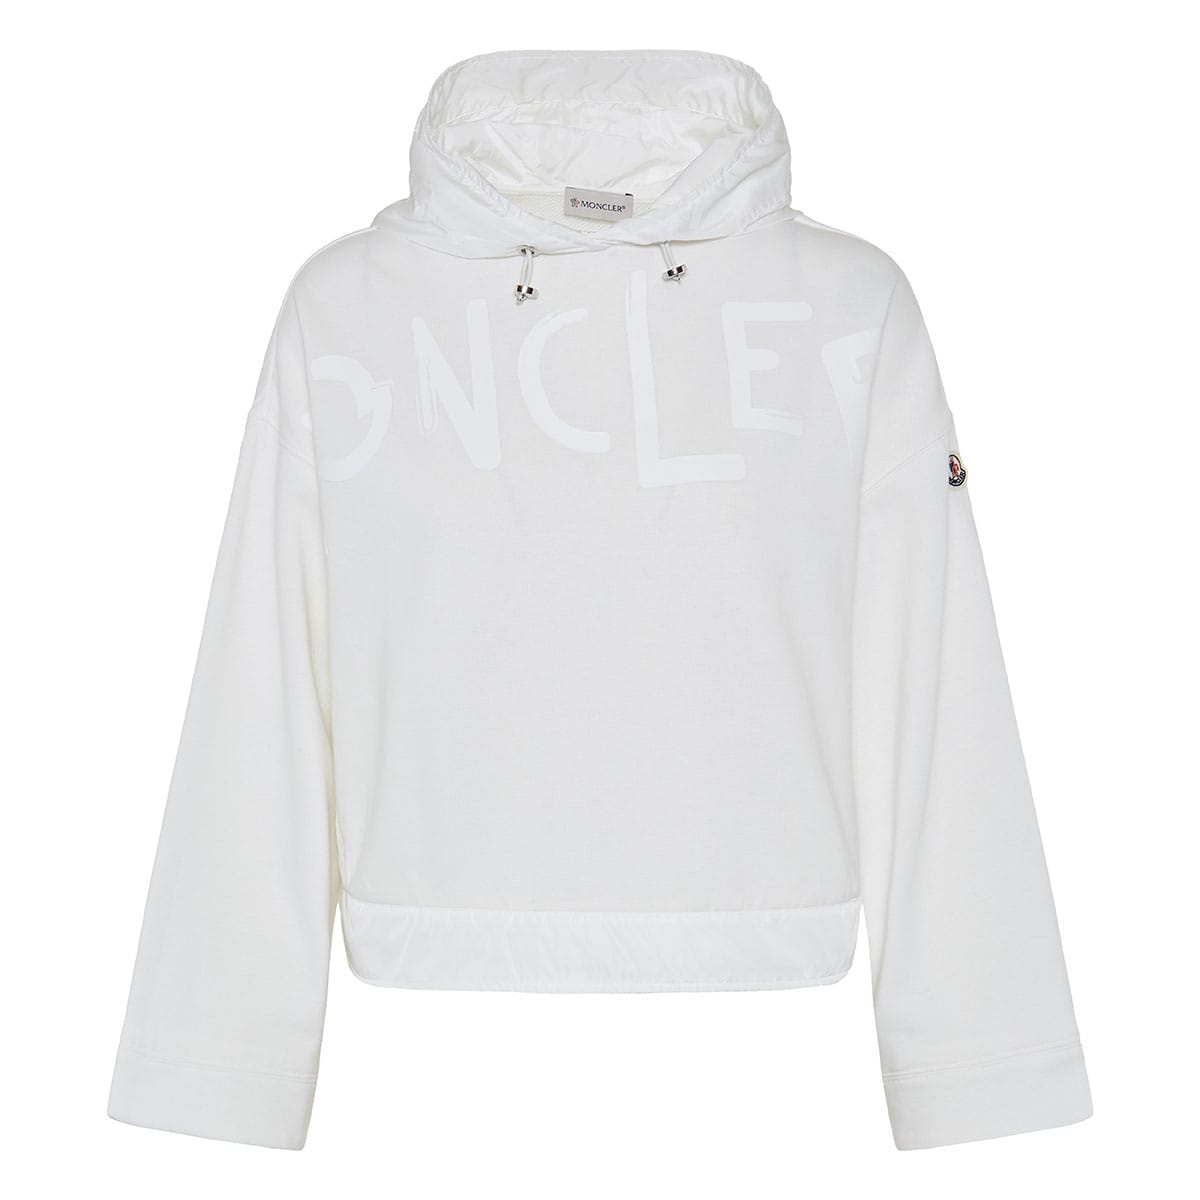 Nylon-trimmed logo hoodie